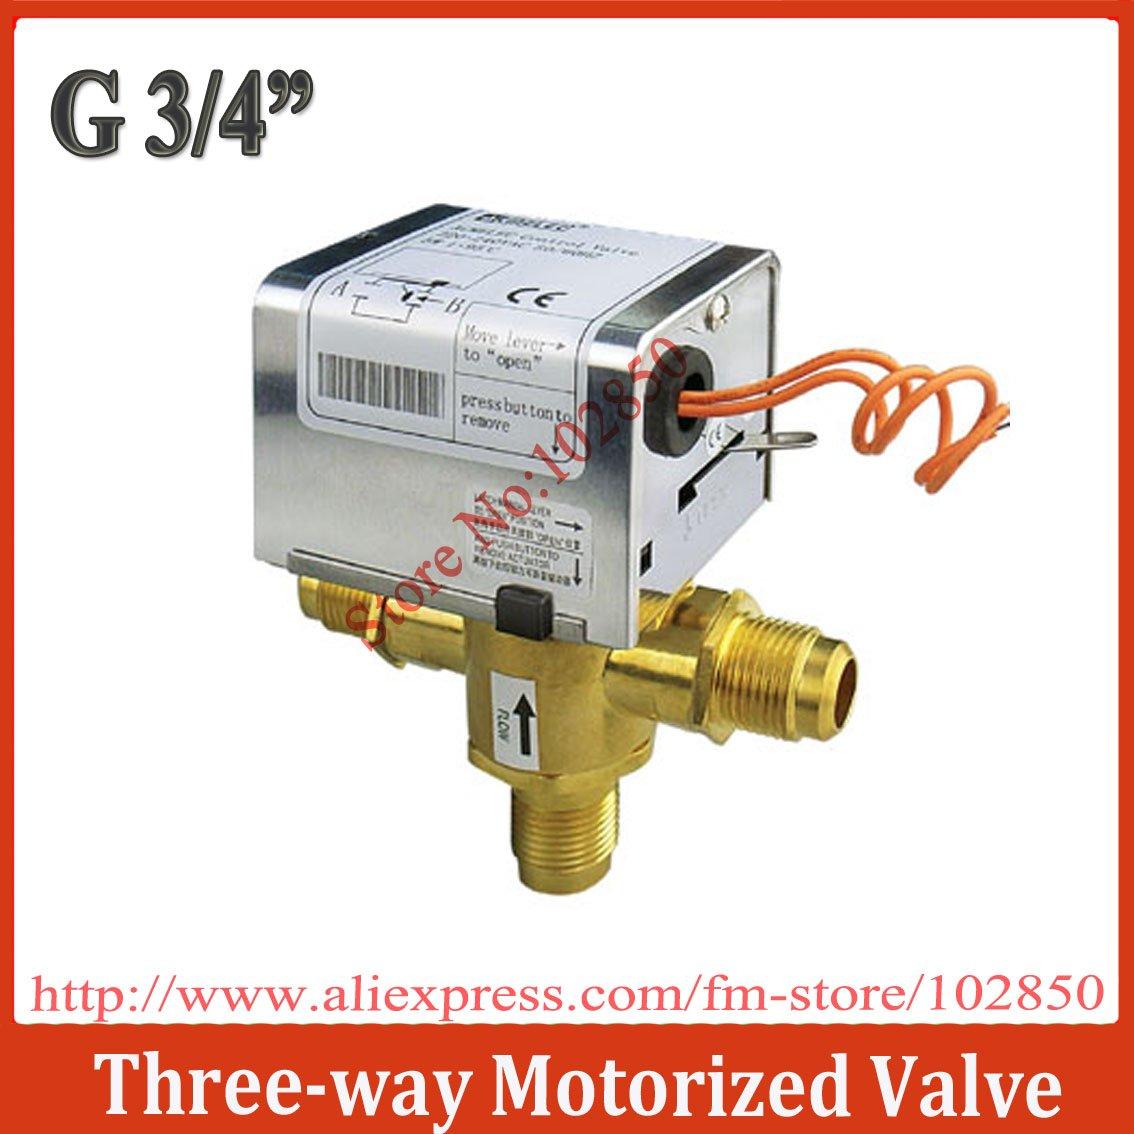 G3 4 Three Way Motorized Ball Valve 2pcs Lot 220 240vac50